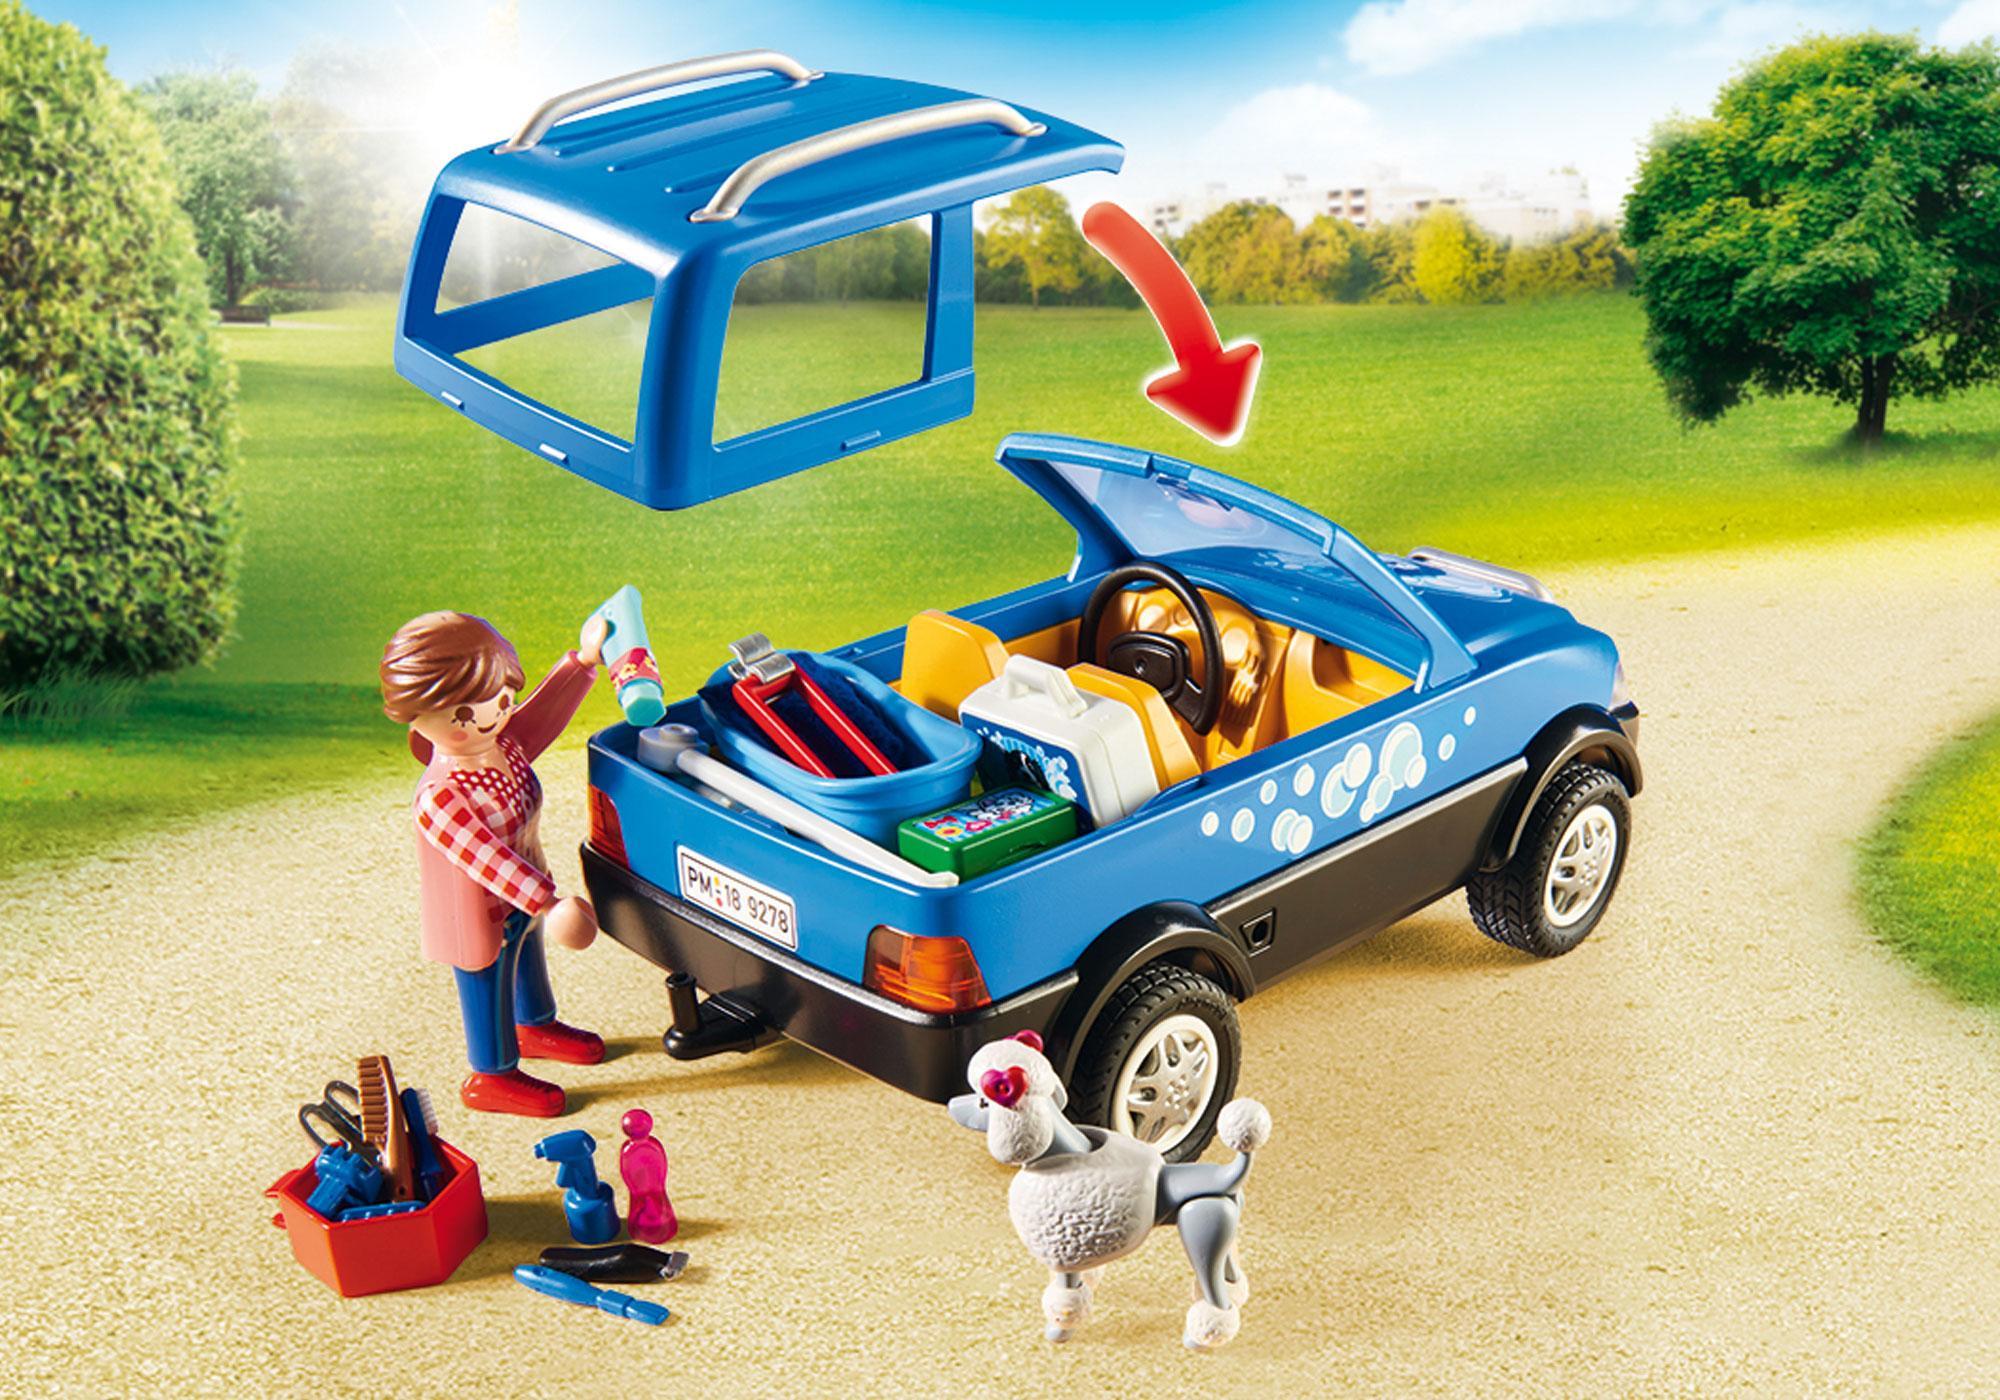 http://media.playmobil.com/i/playmobil/9278_product_extra1/Mobile Pet Groomer